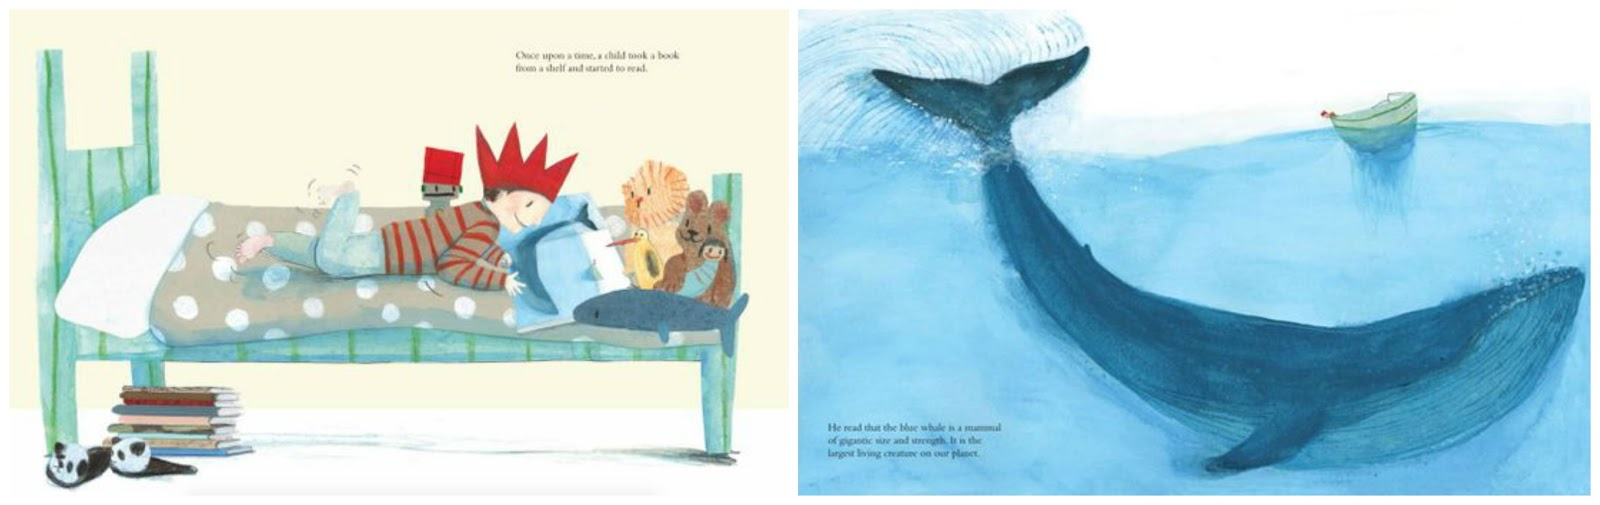 Randomly Reading: The Blue Whale and The Polar Bear, two books ...